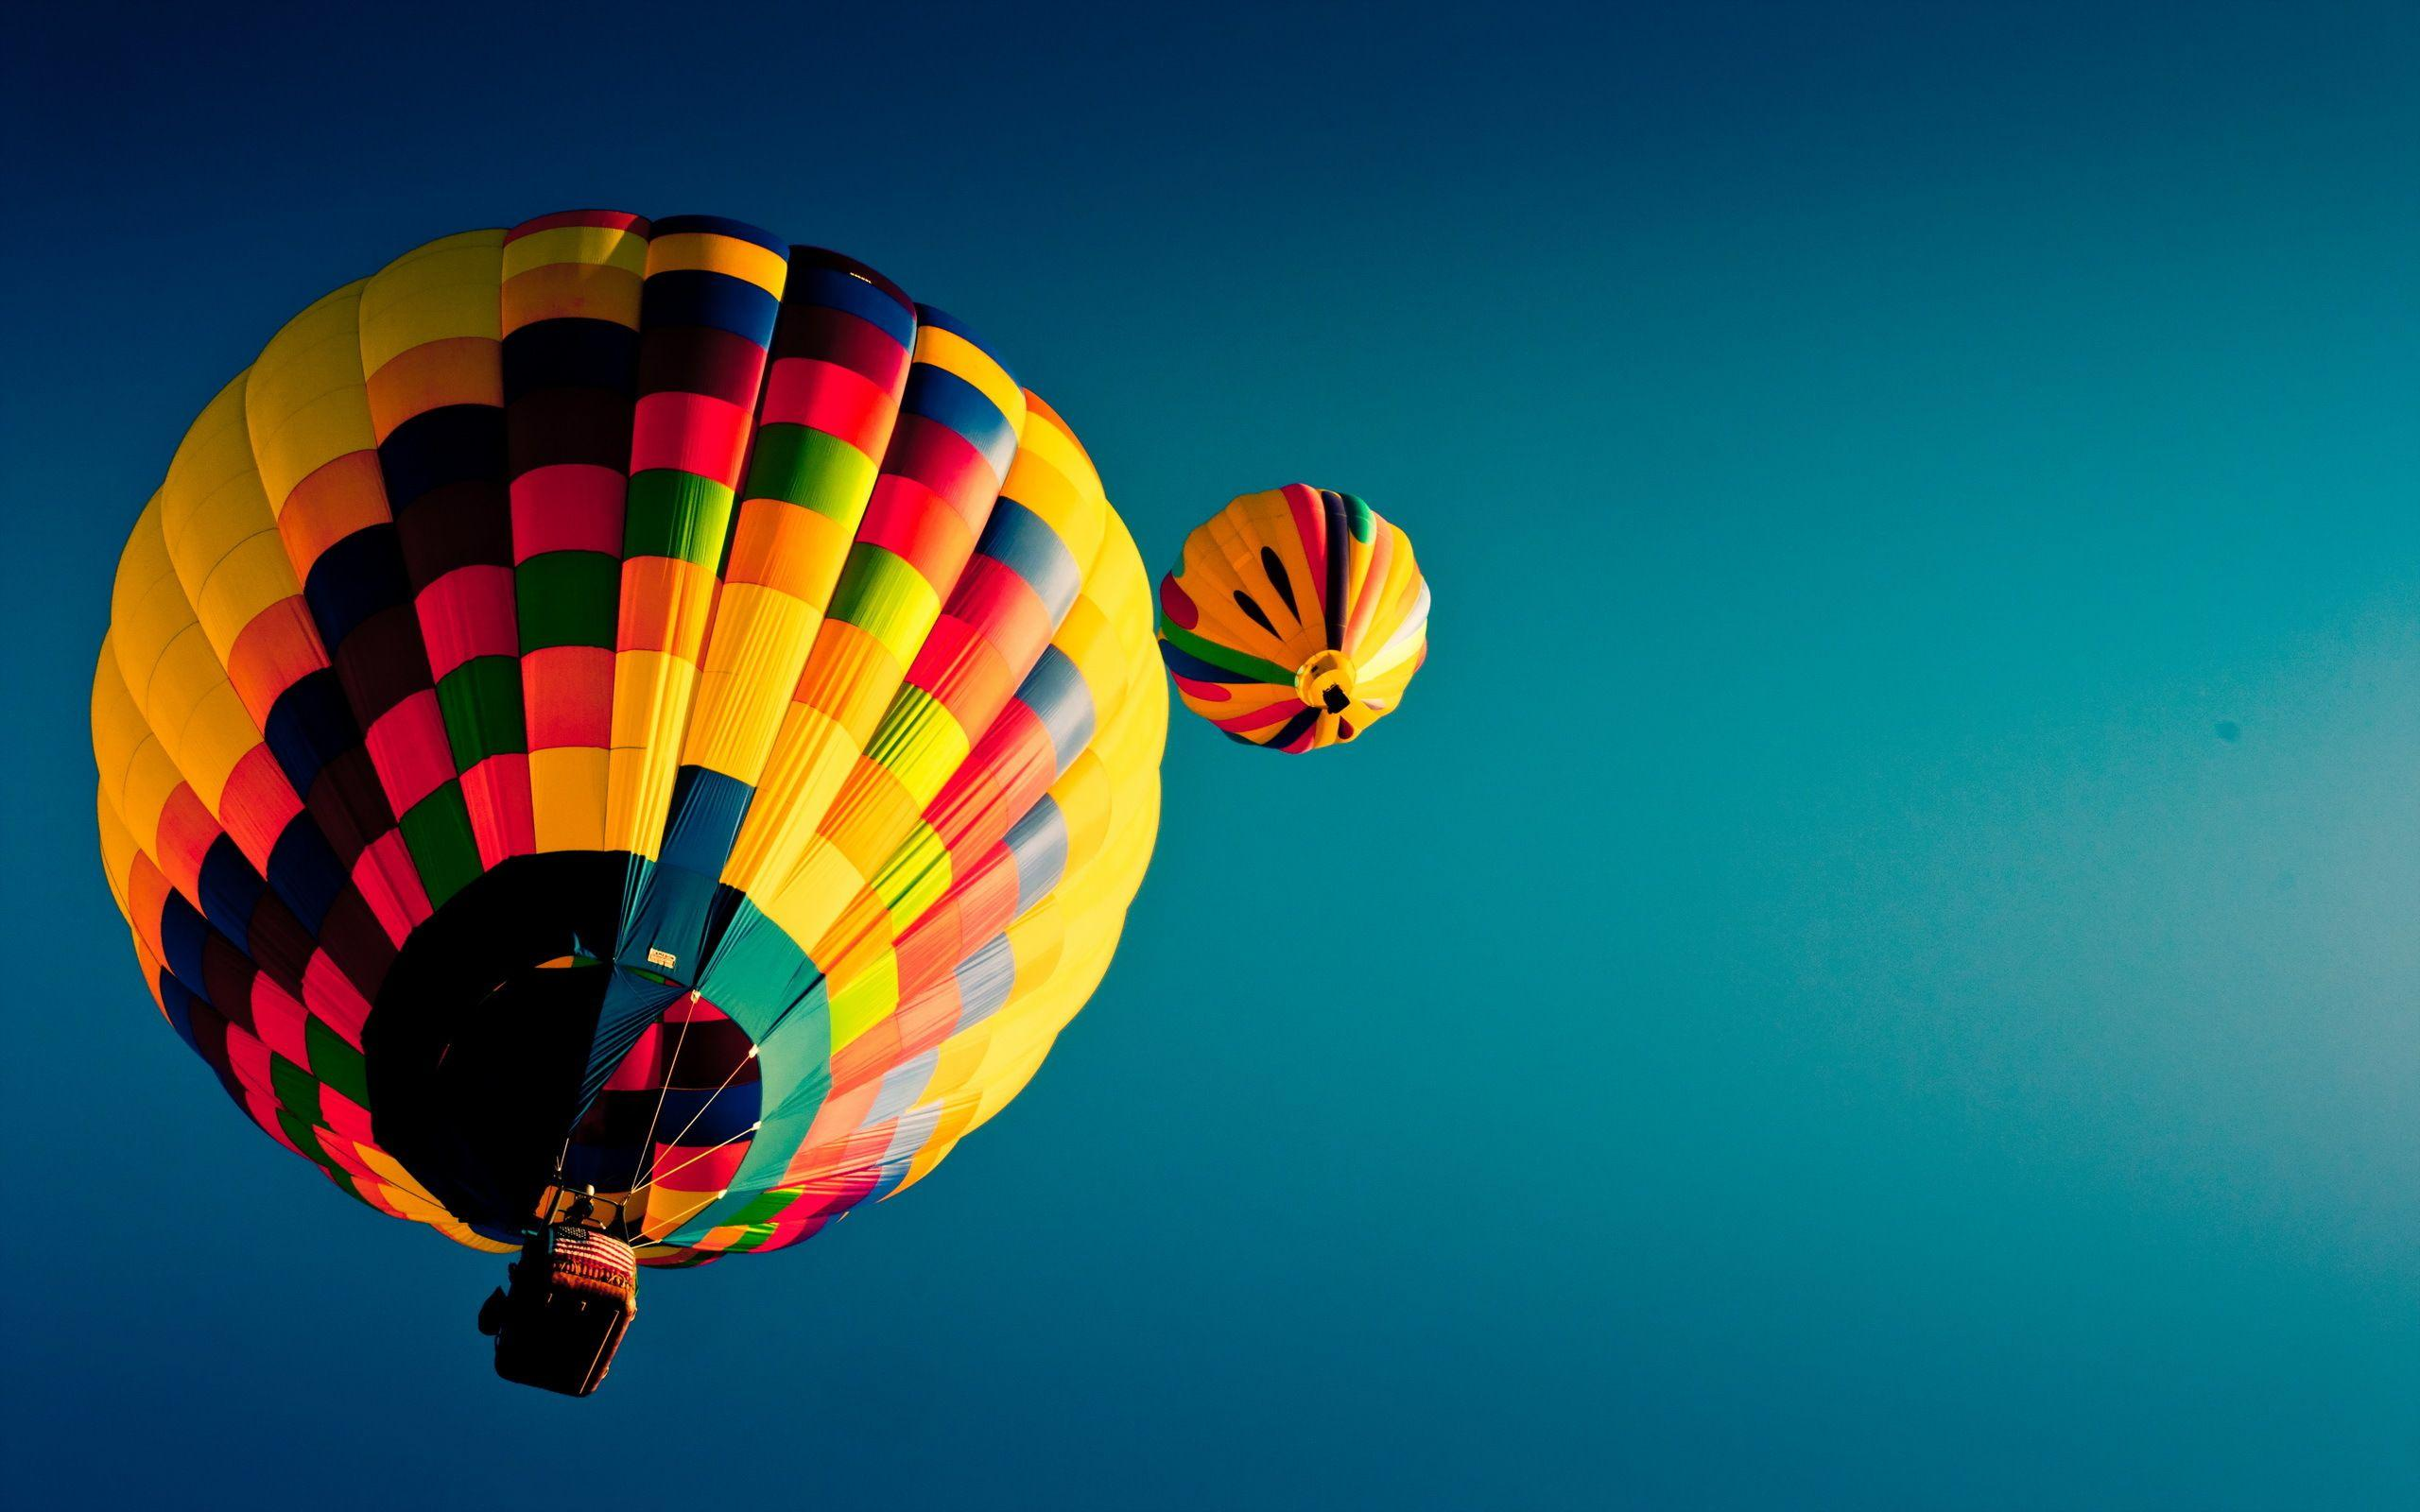 Hot Air Balloon HD Wallpapers - Wallpaper Cave